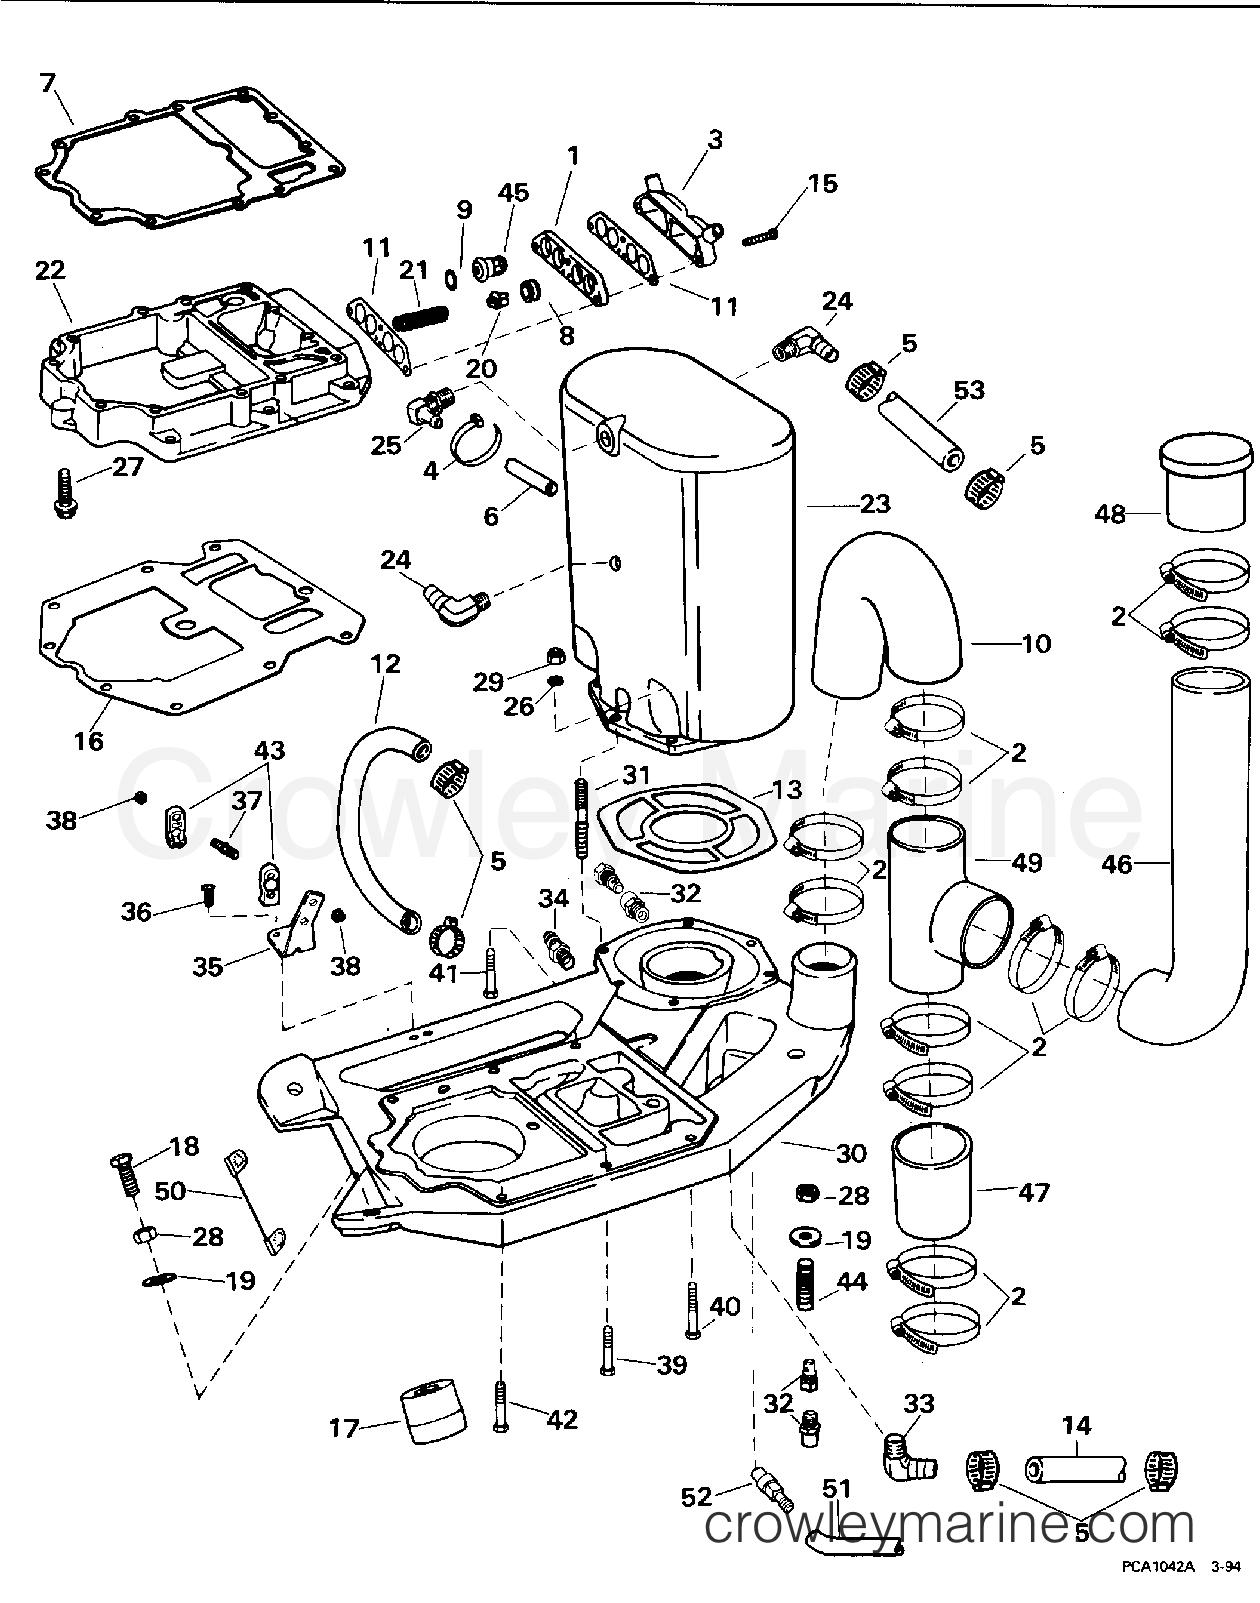 DIAGRAM] Wiring Diagram Omc 115 Turbojet FULL Version HD Quality 115  Turbojet - WAREHOUSEDESIGN.JTNETTOYAGE.FR